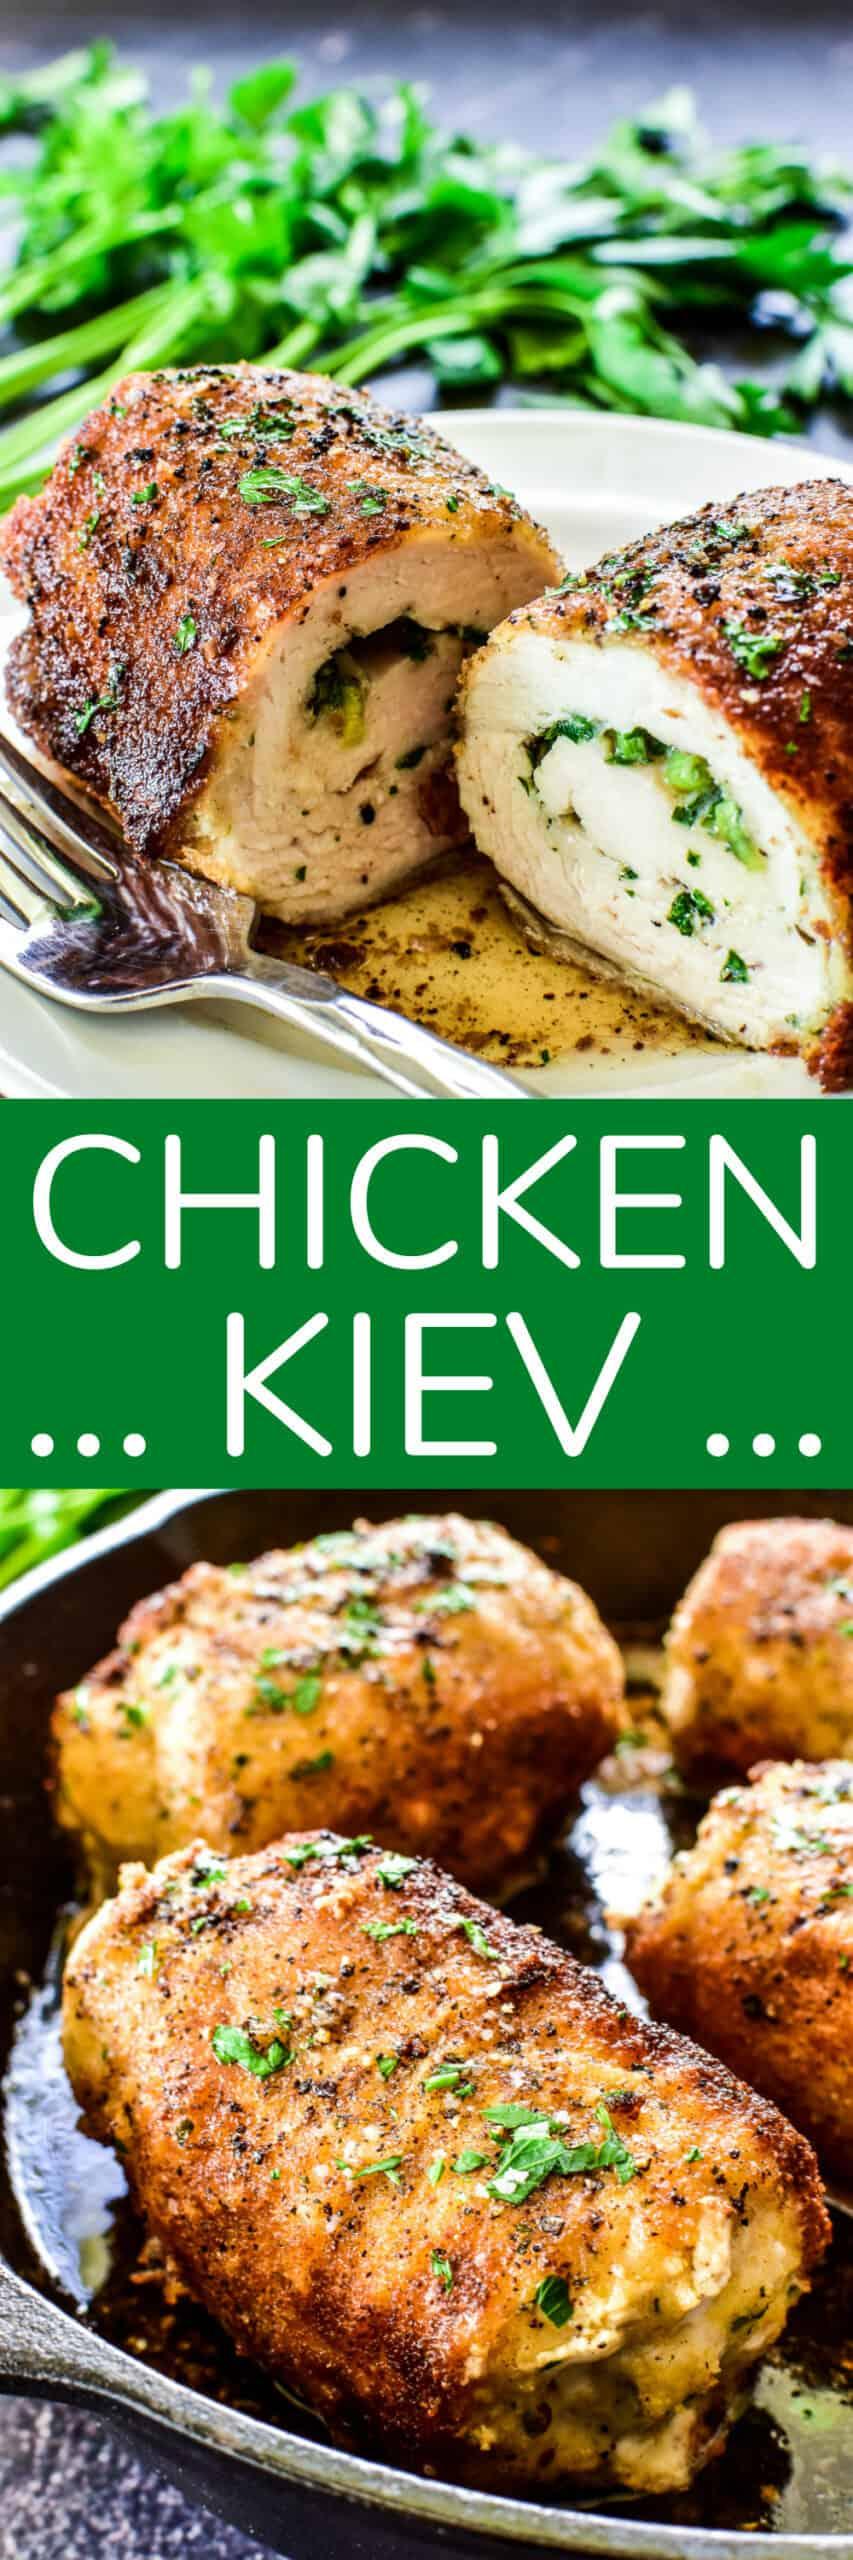 Chicken Kiev collage image